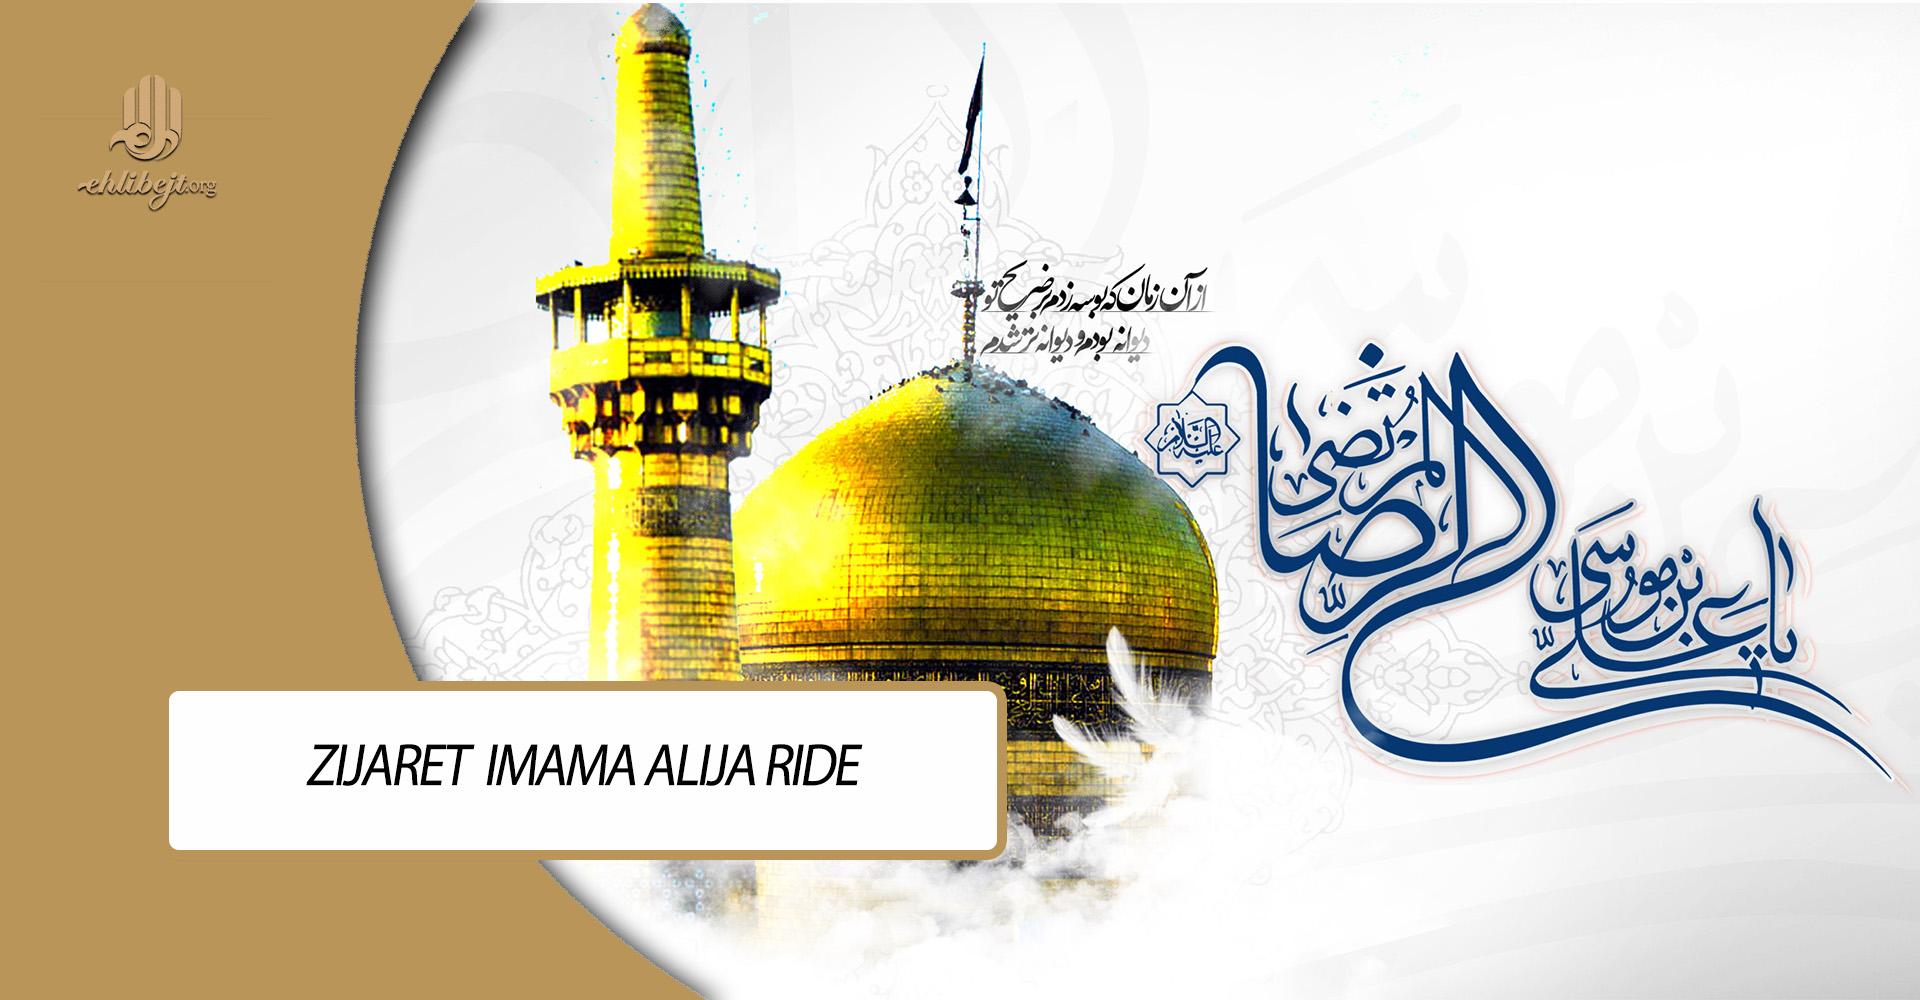 Zijaret Imama Alija ibn Musaa Ride, a.s.